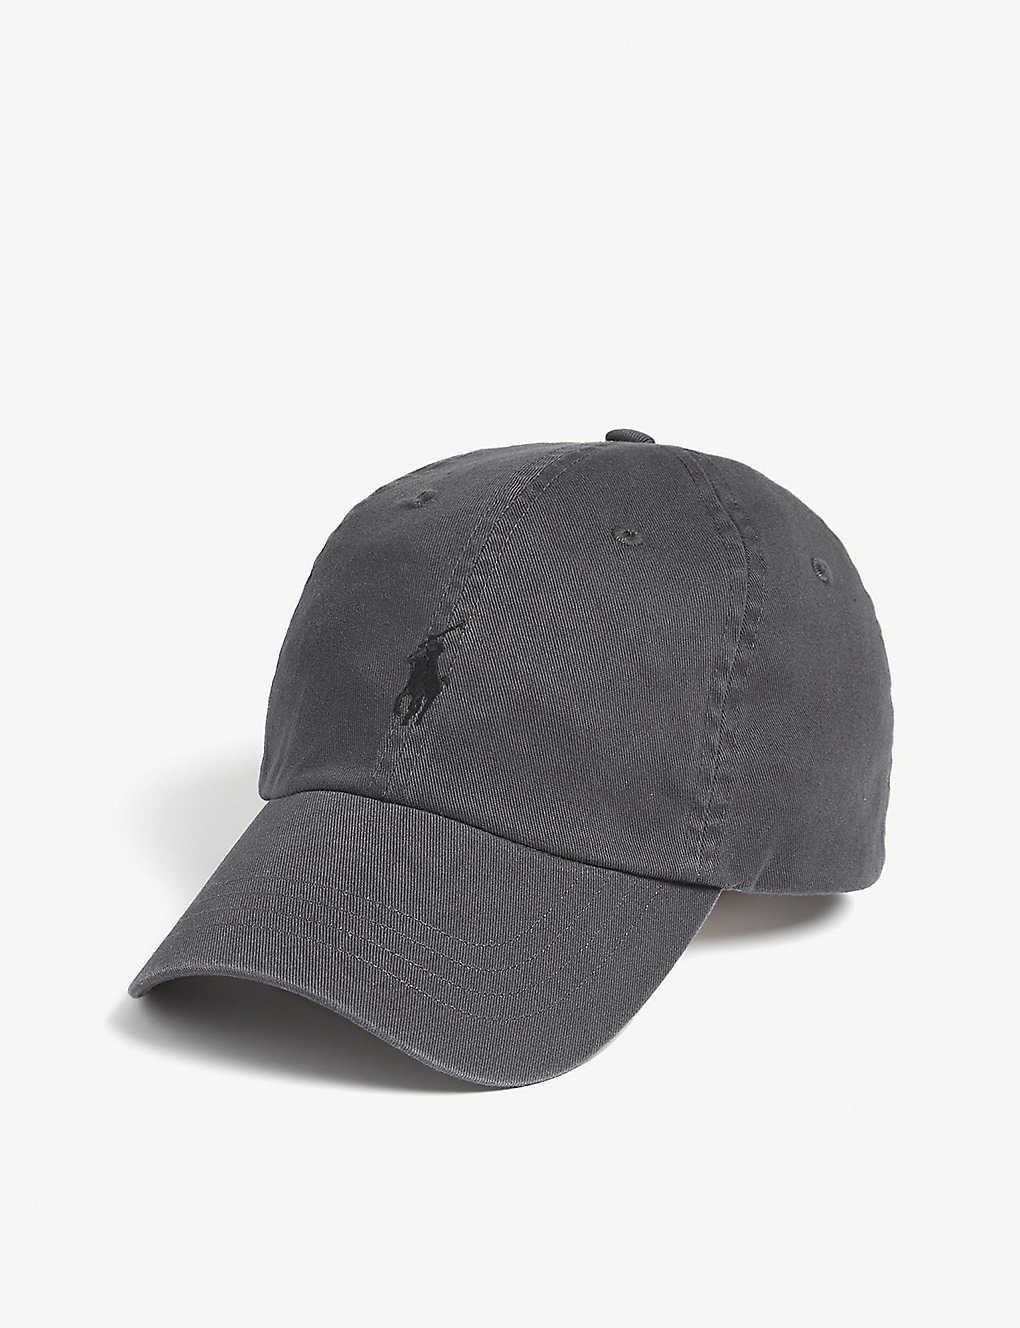 071e686b97a POLO RALPH LAUREN - Pony baseball cap